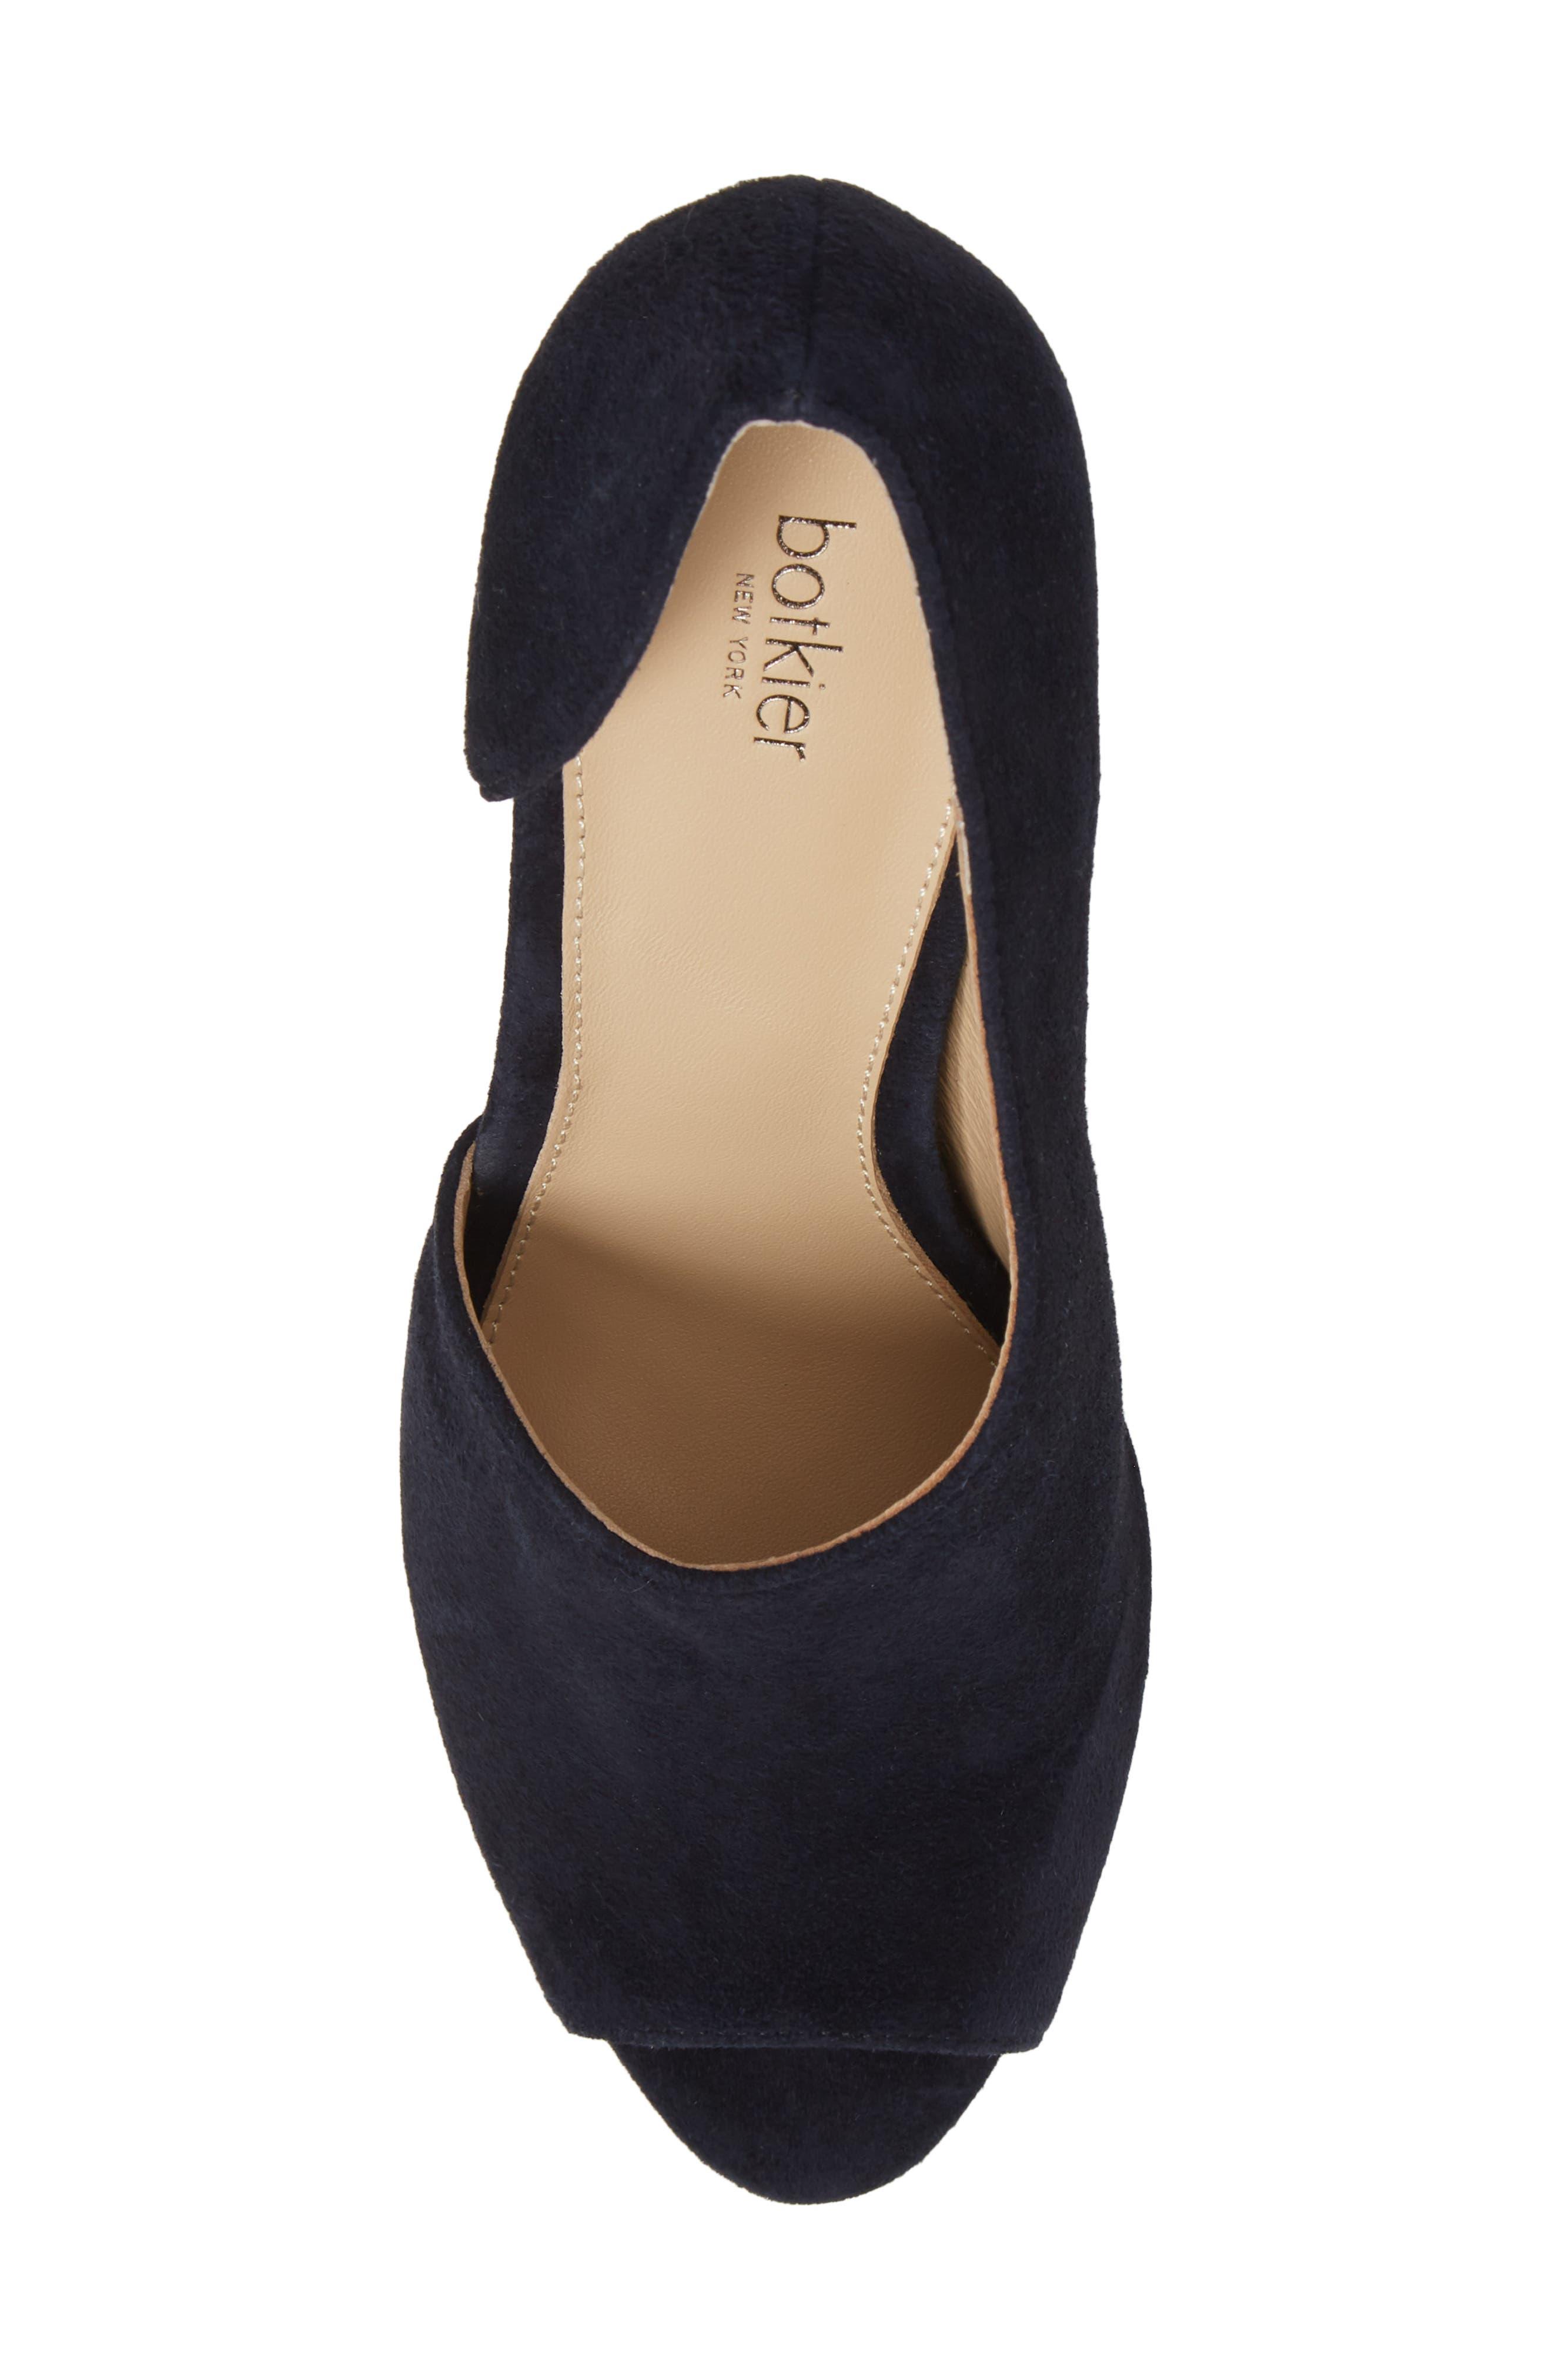 Adelia Asymmetrical Sandal,                             Alternate thumbnail 5, color,                             Navy Suede